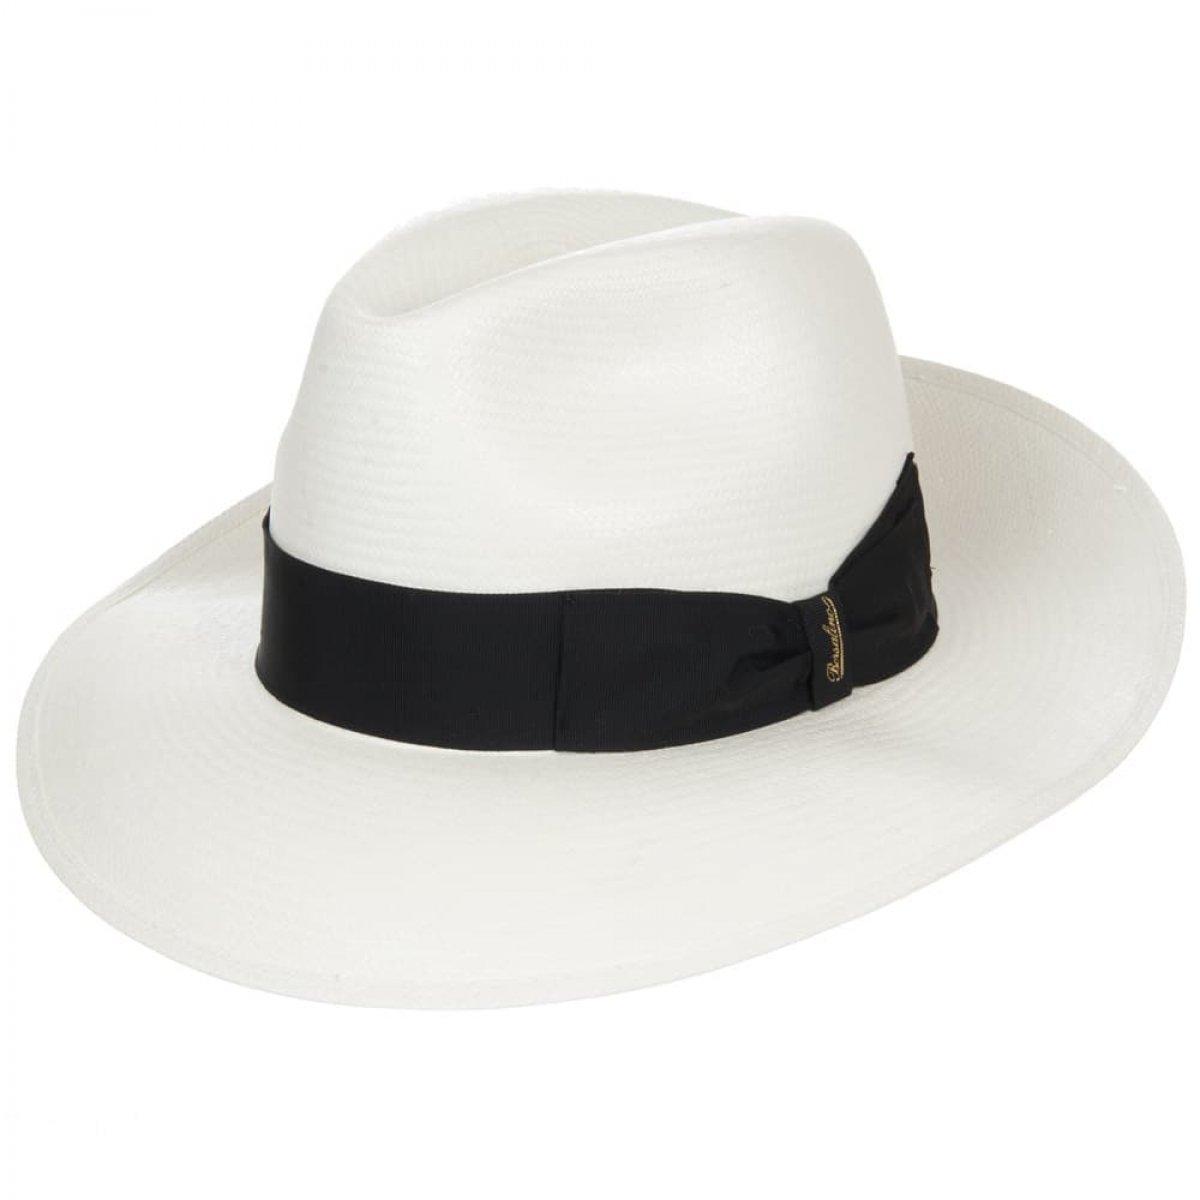 Panama BorsalinoA Cappello Tesa In Larga Bianco l1cKJTF3